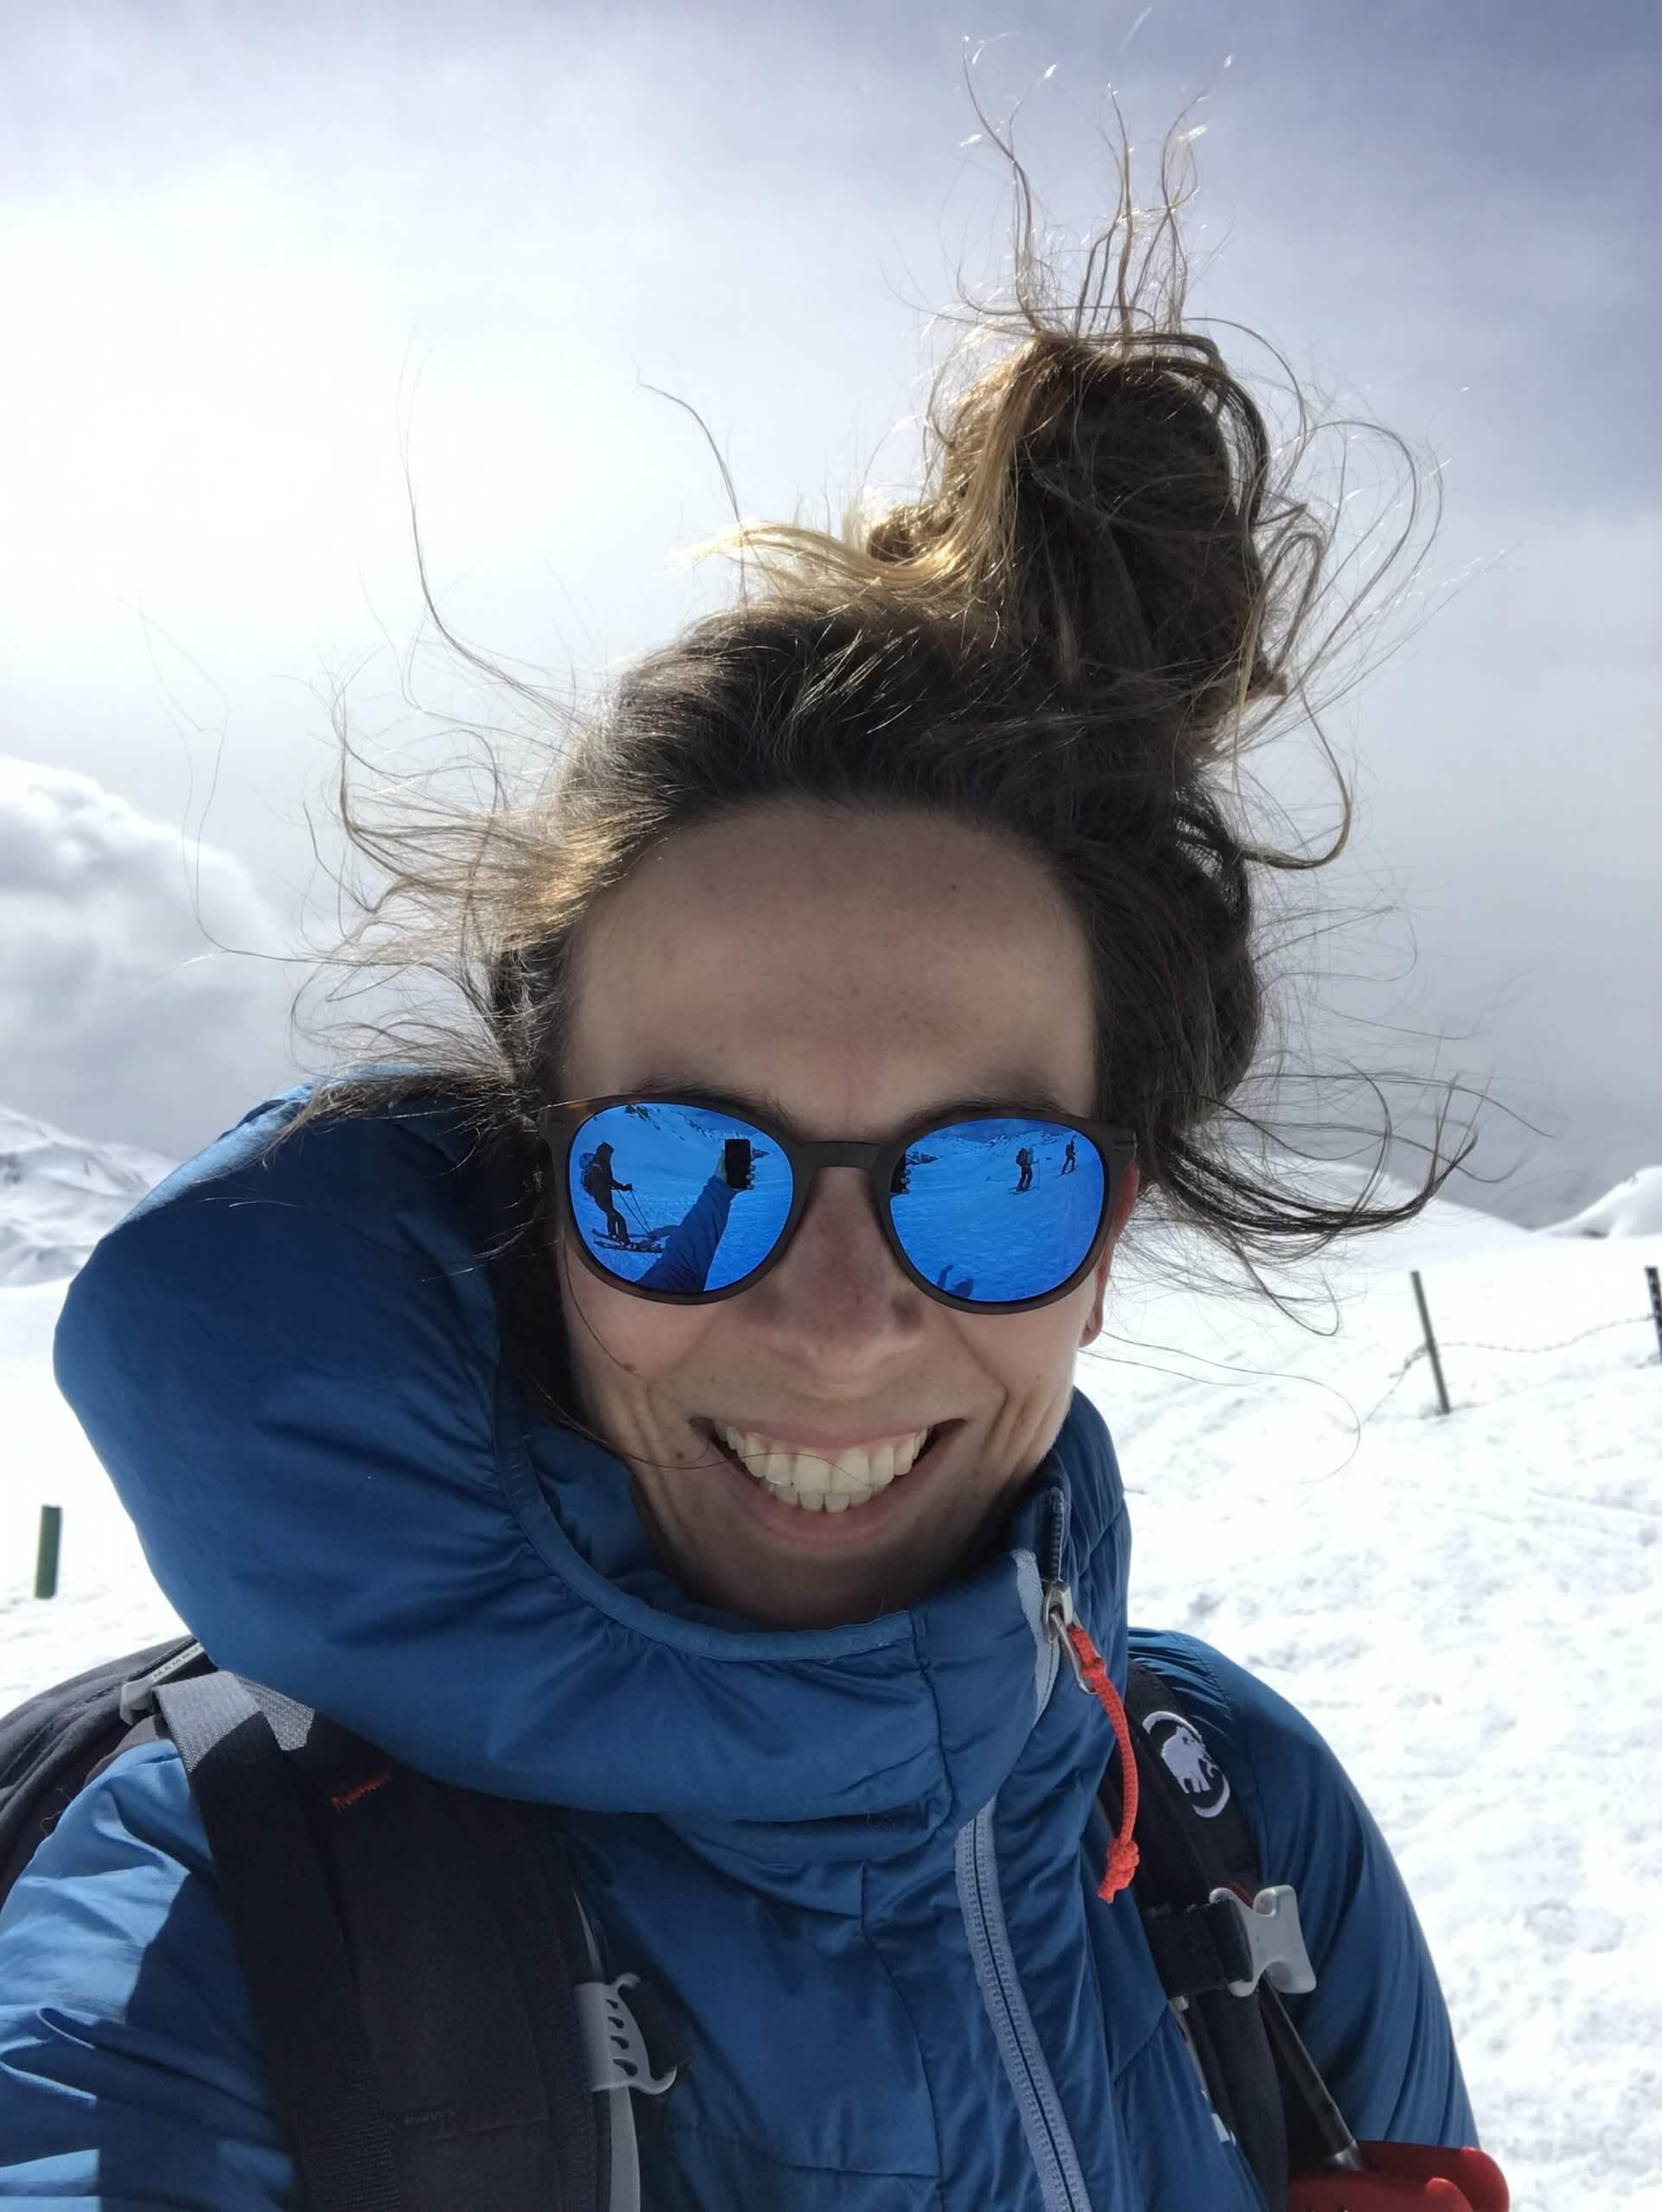 Kernteam Mitglied Rachel Pechholz Splitboarden Winter